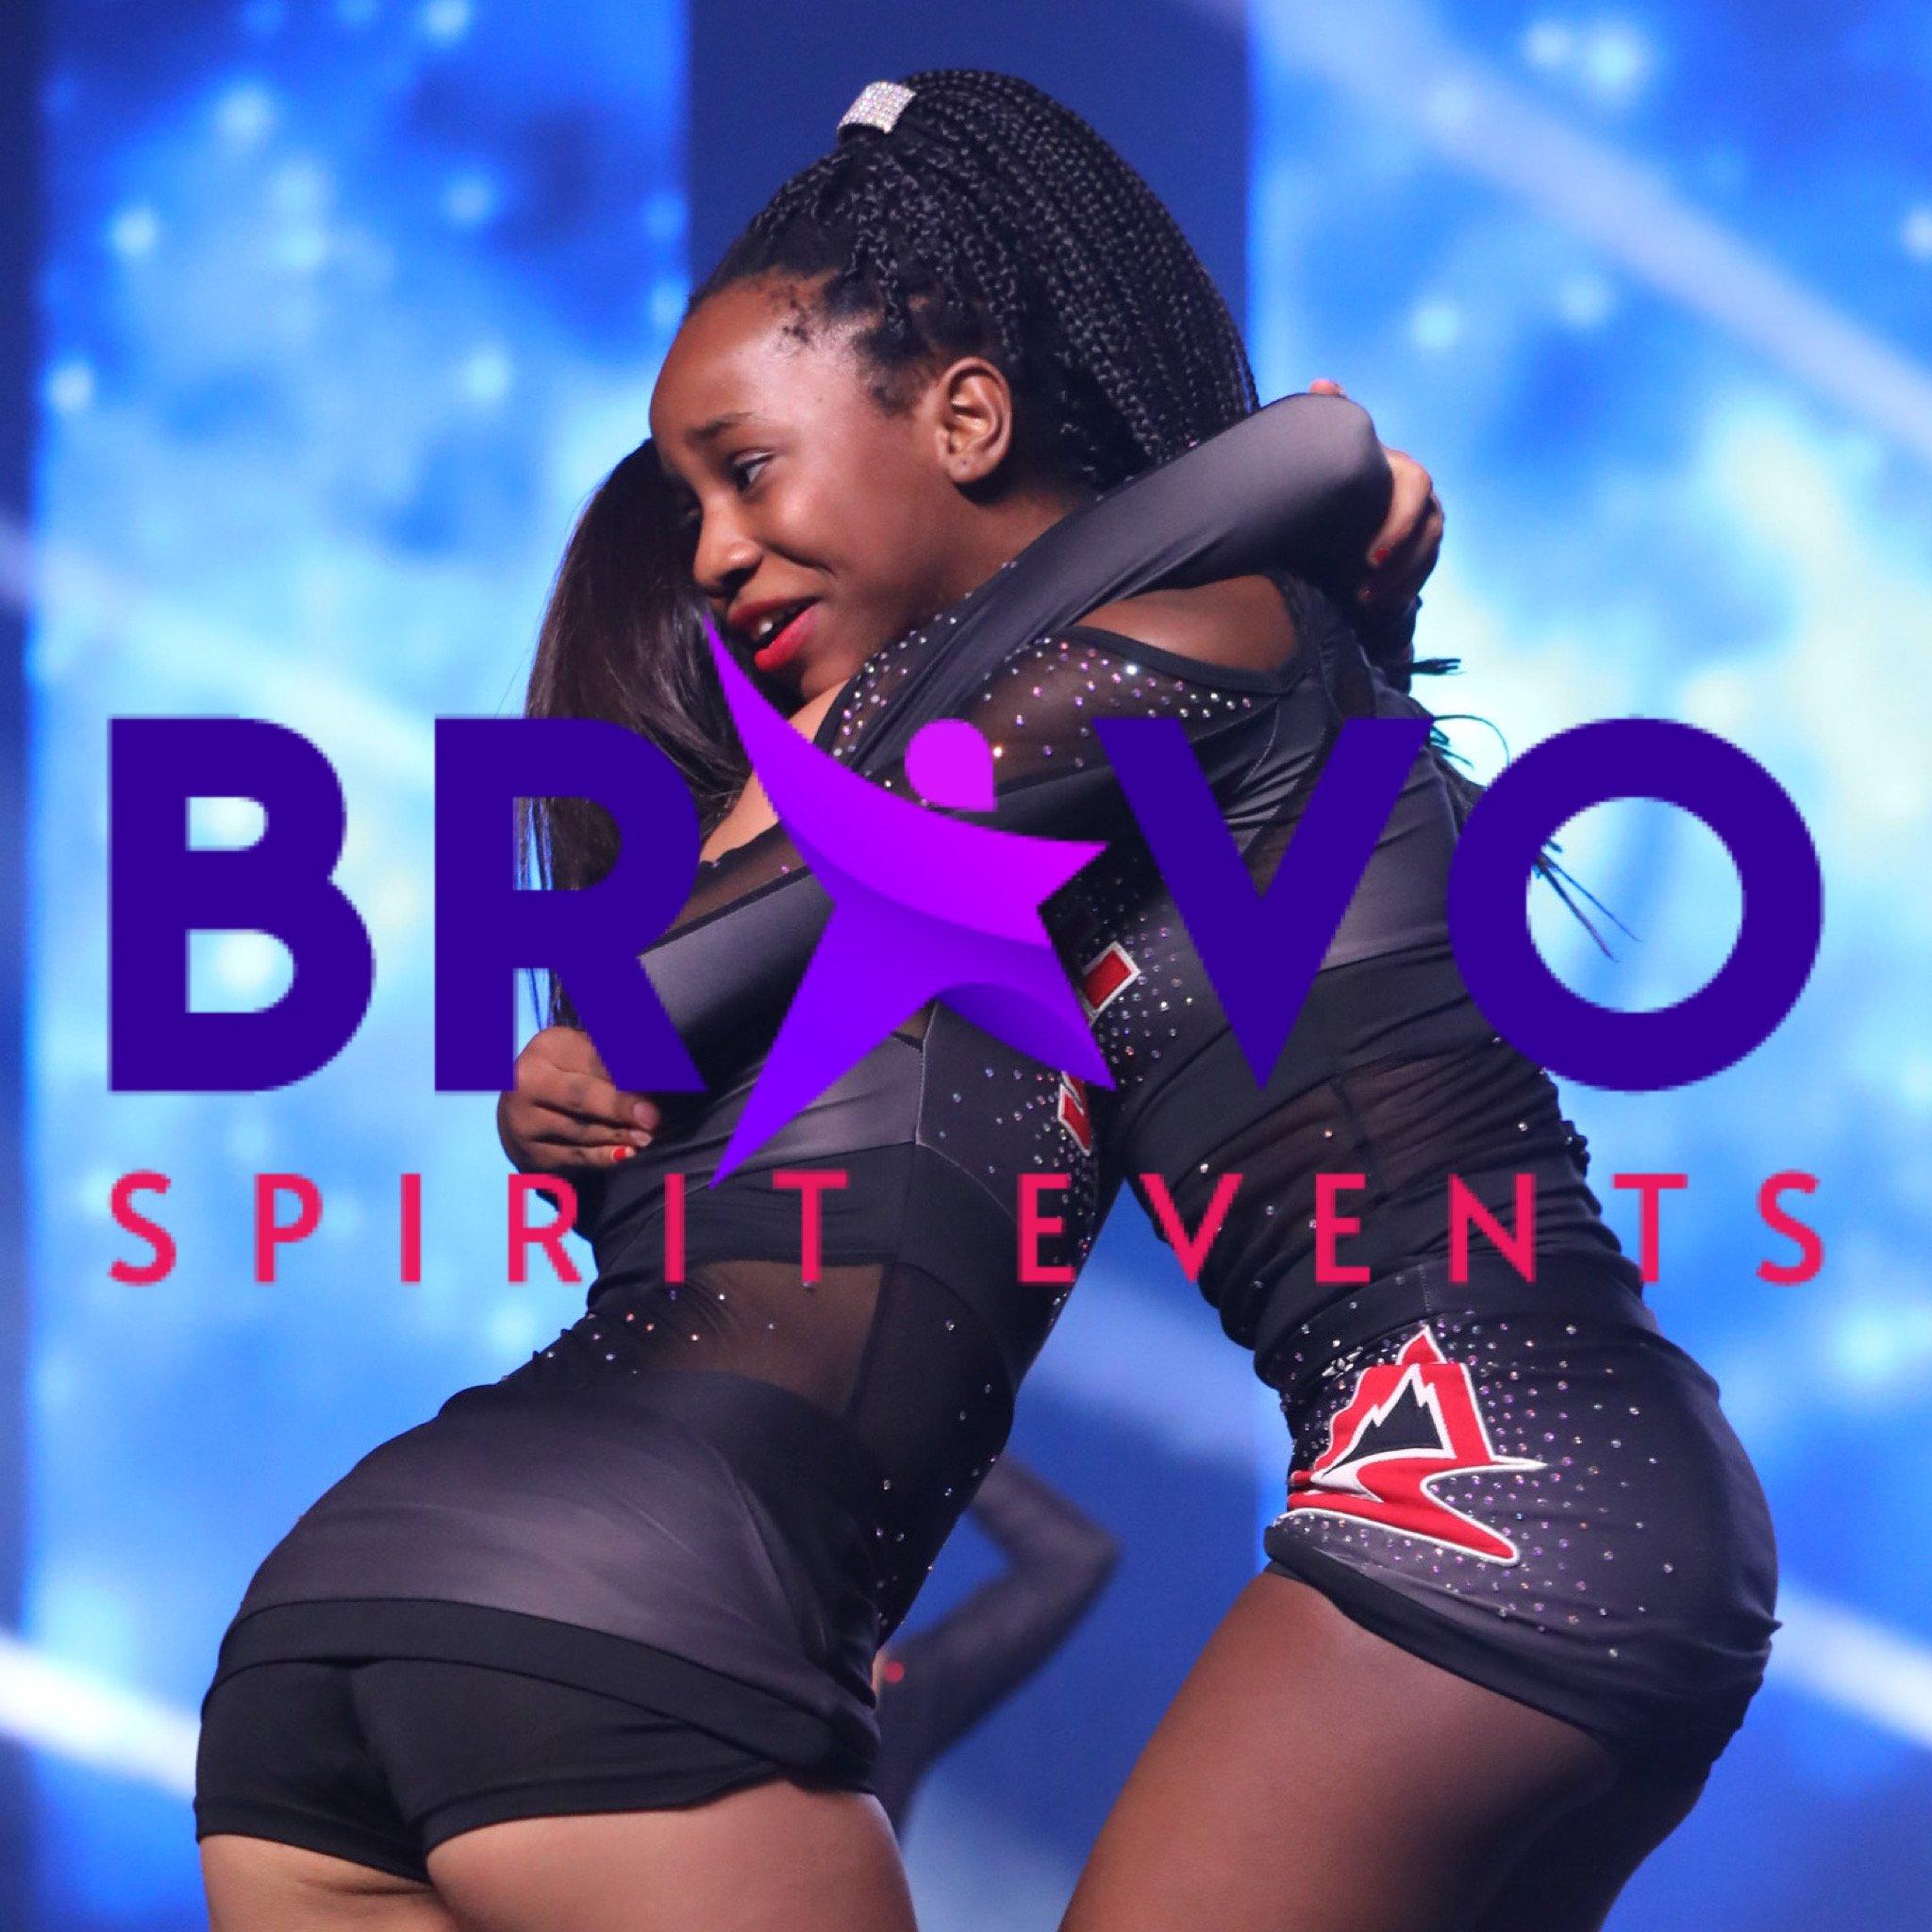 Bravo Spirit Events